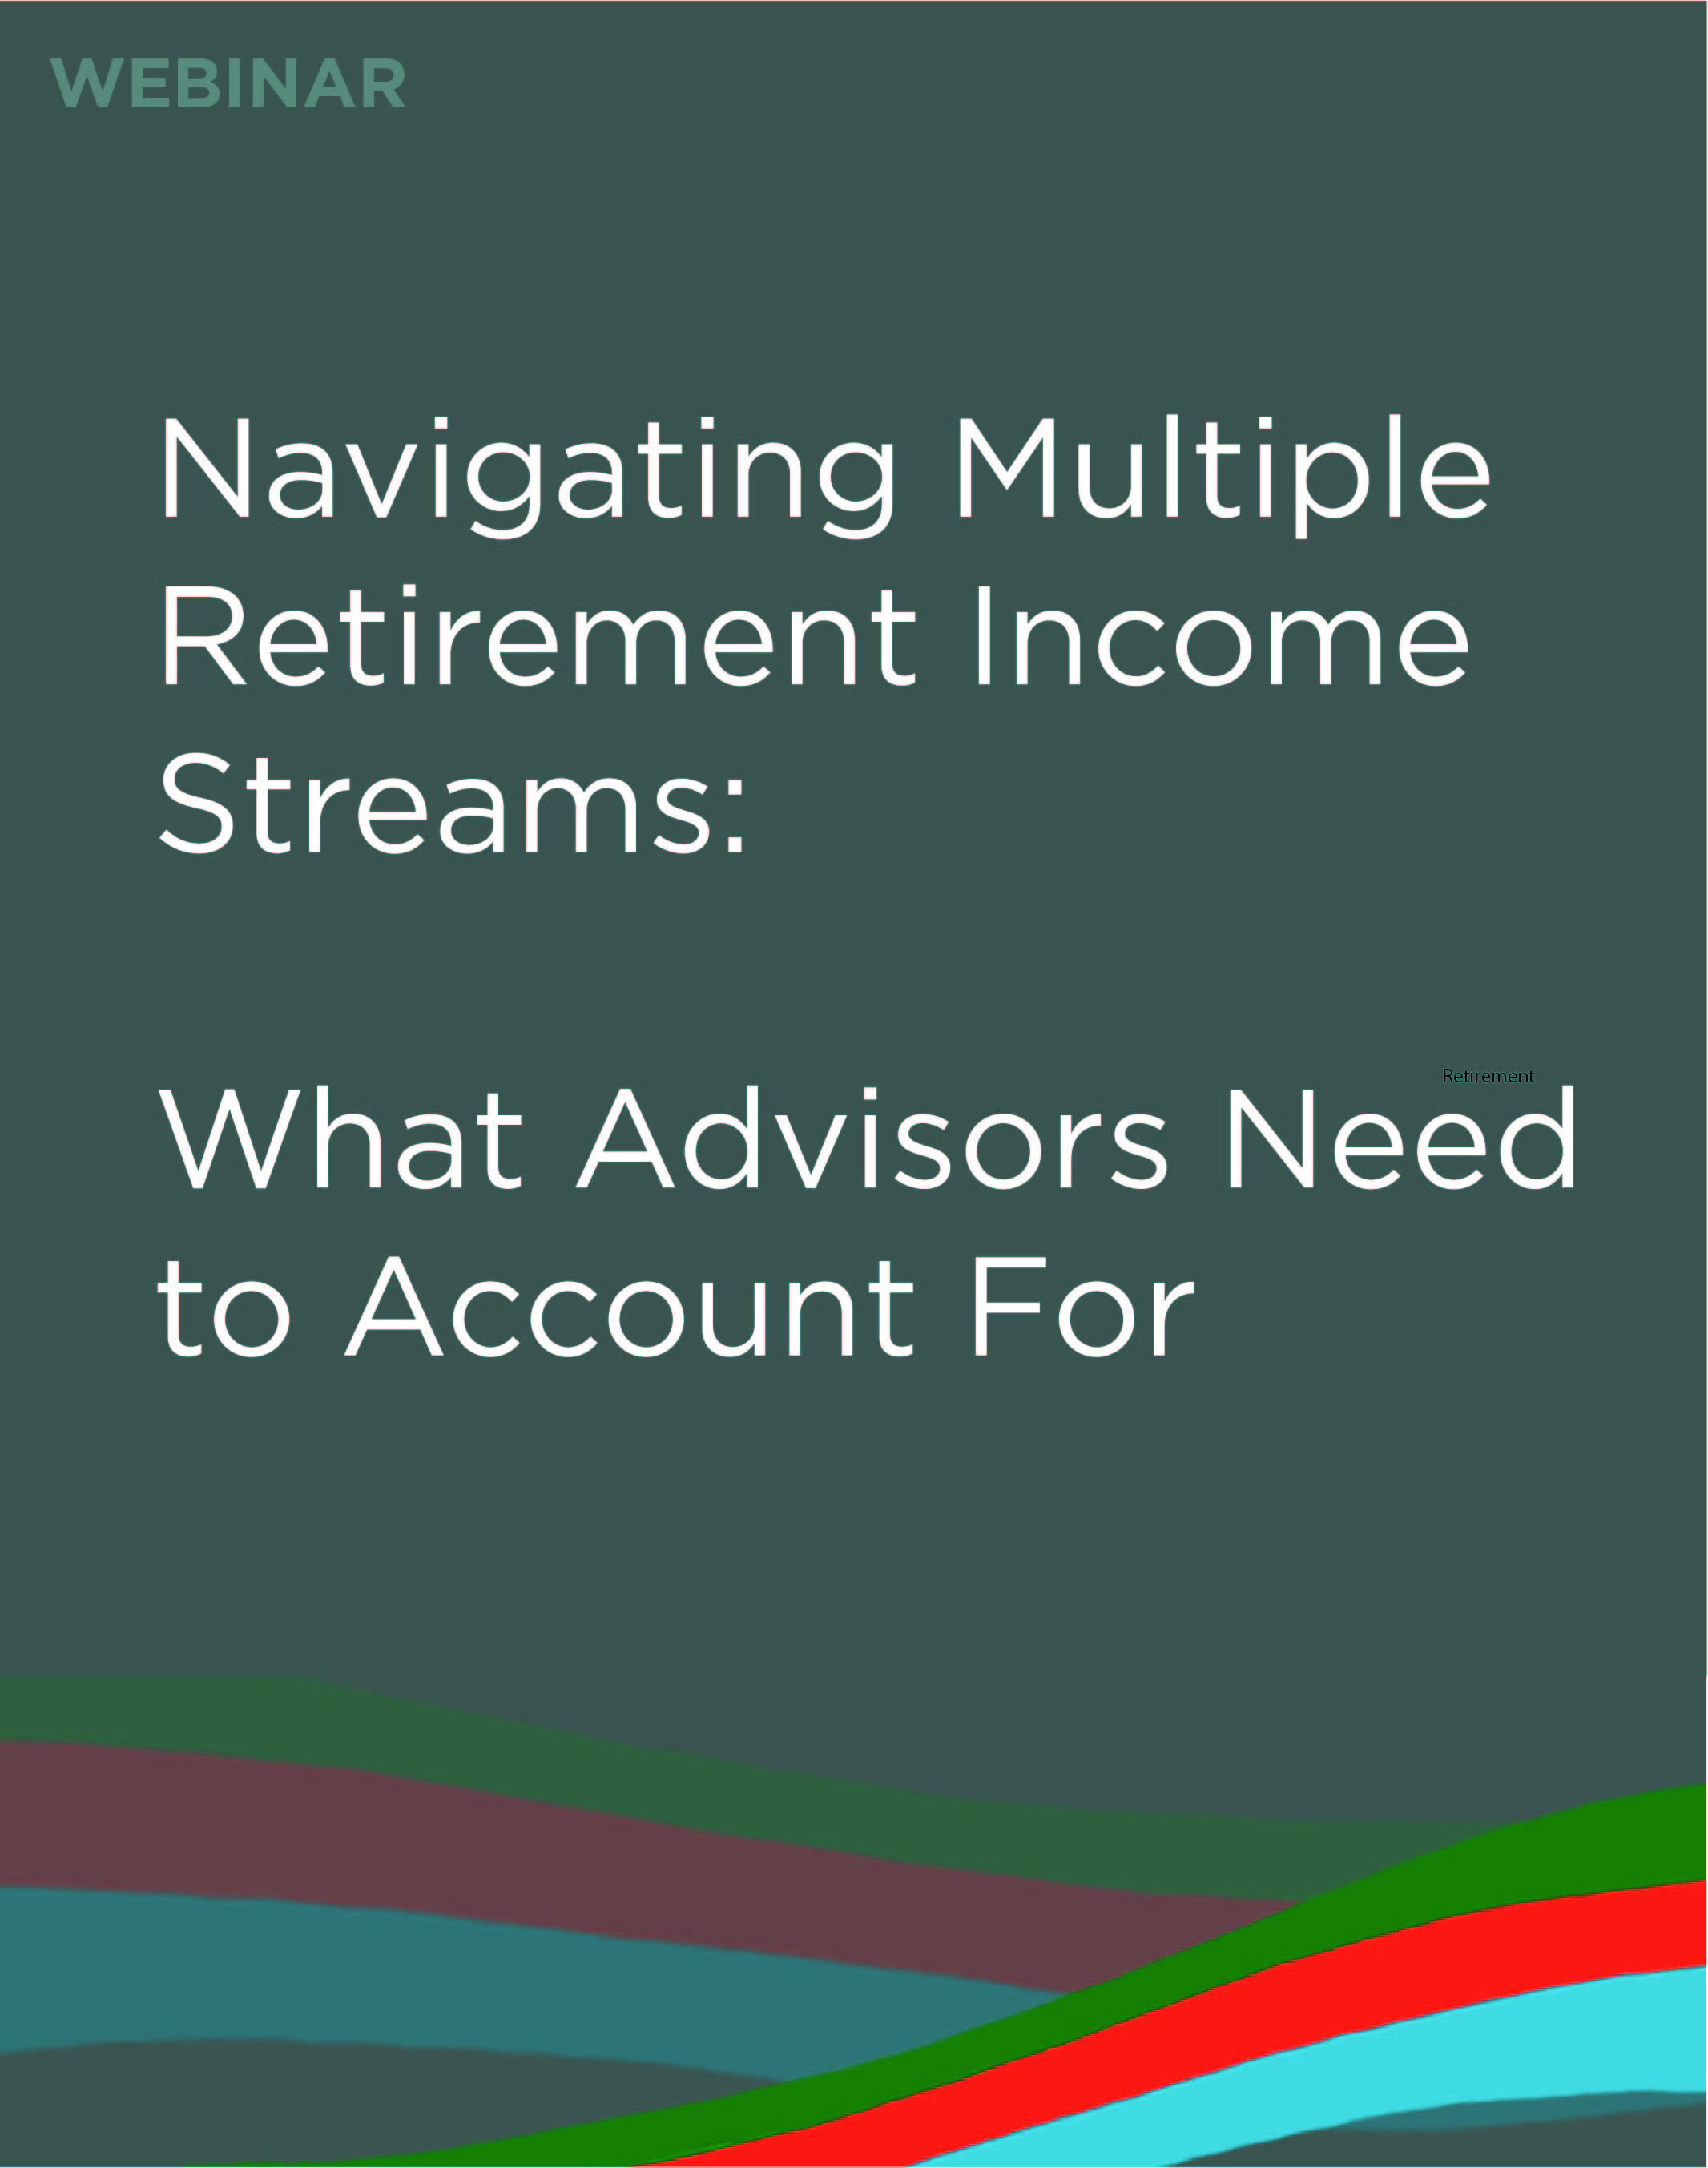 Navigating Multiple Retirement Income Streams